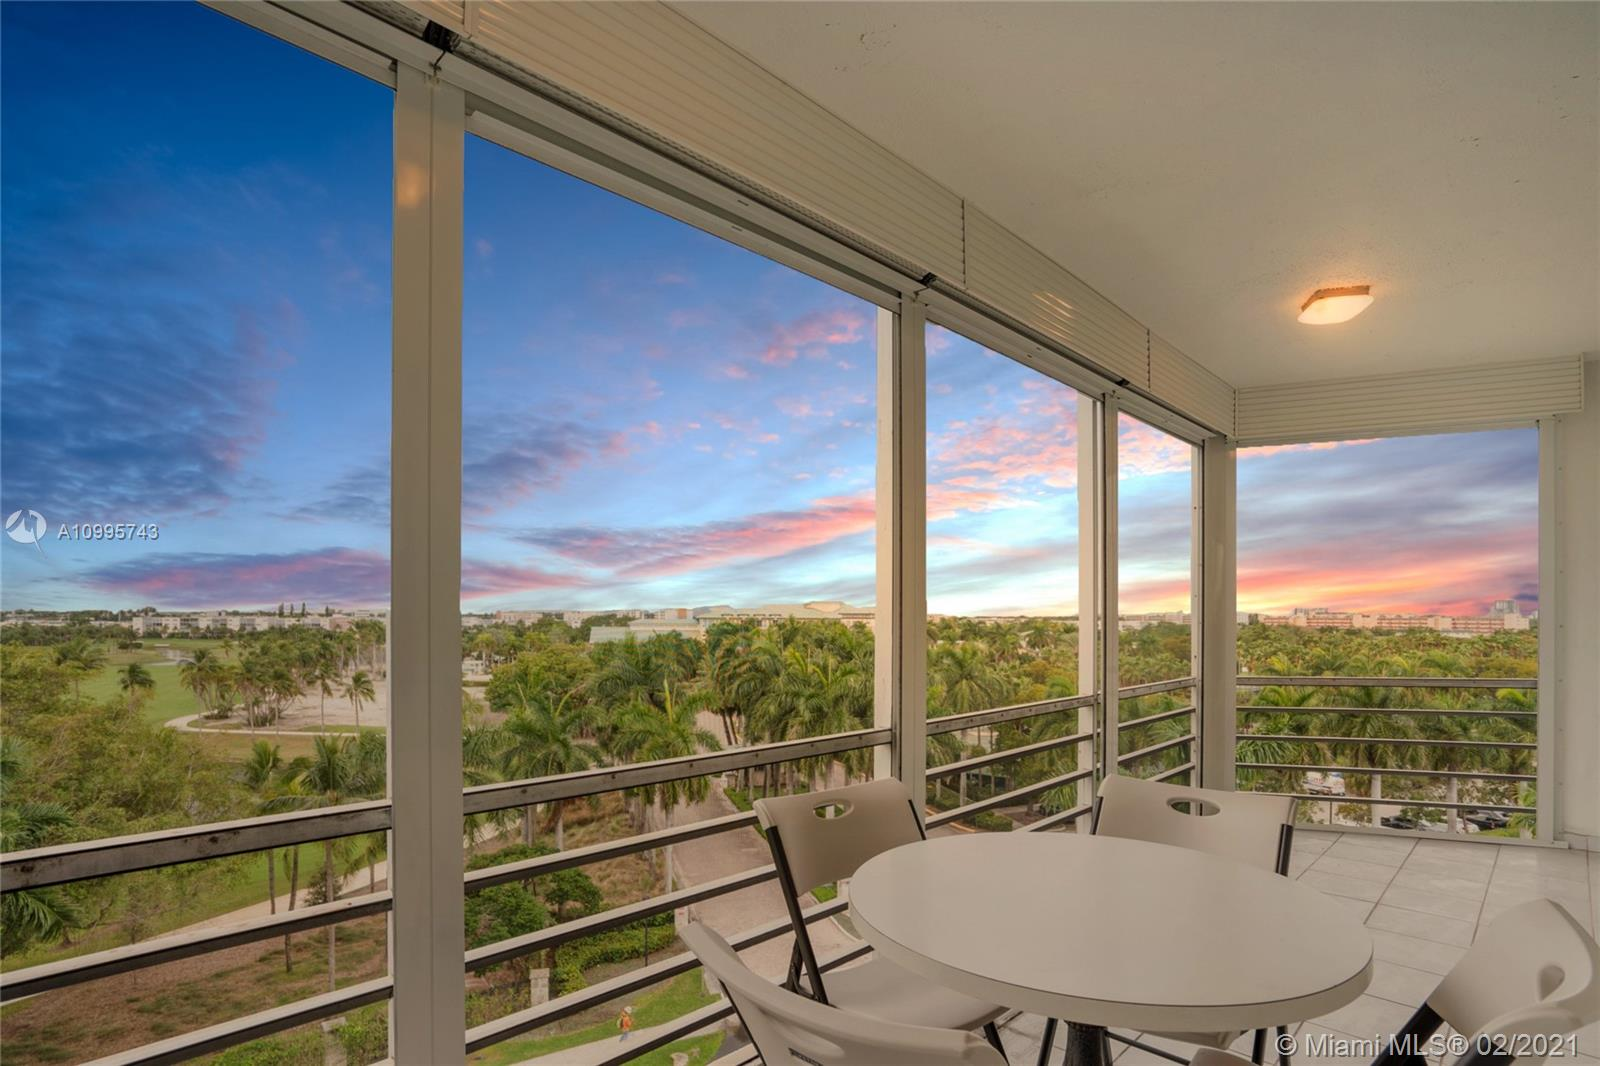 Fairways Riviera #701 - 400 Diplomat Pkwy #701, Hallandale Beach, FL 33009